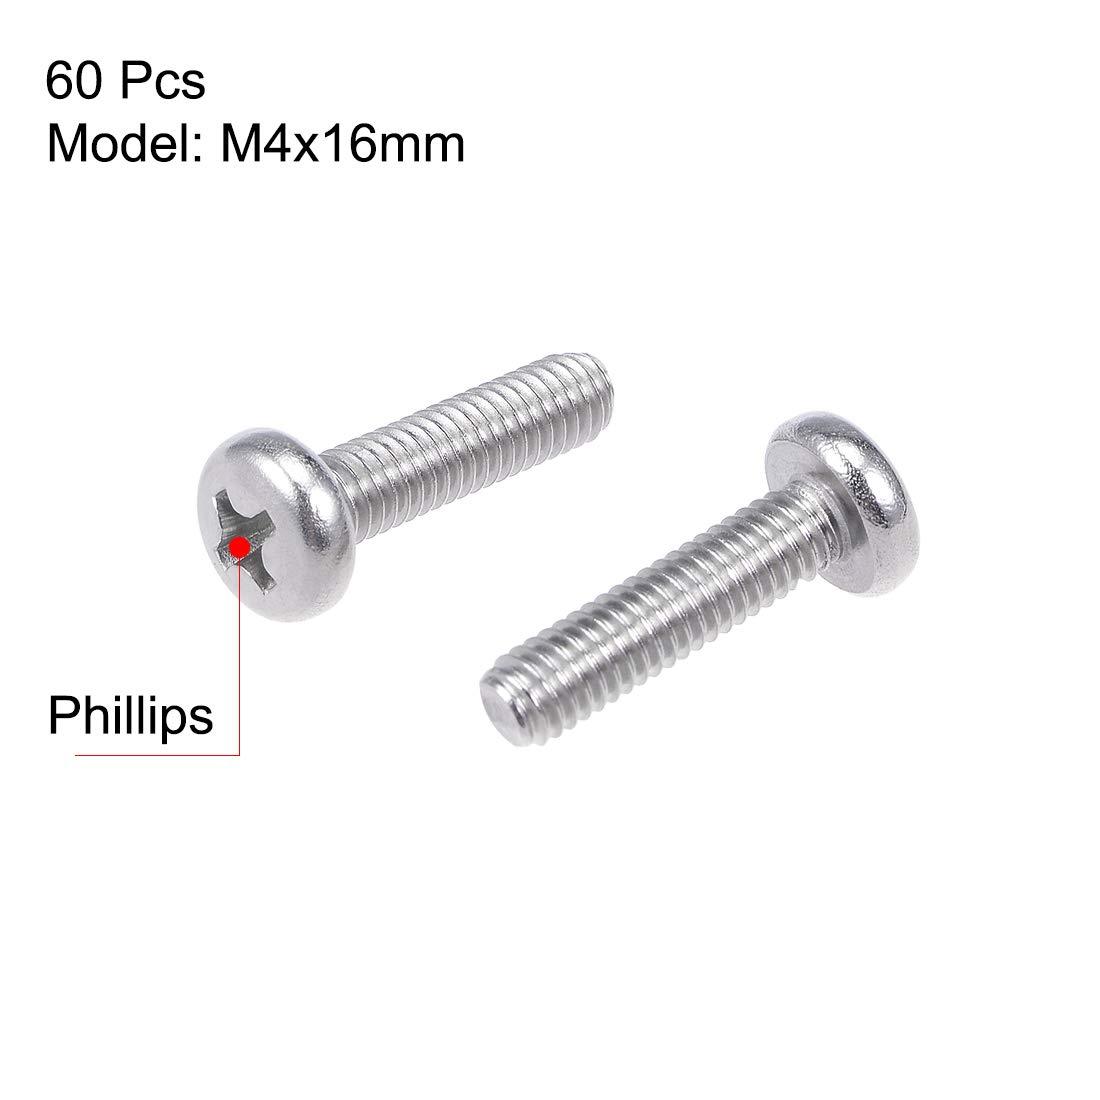 uxcell M4x16mm Machine Screws Pan Phillips Cross Head Screw 304 Stainless Steel Fasteners Bolts 30Pcs